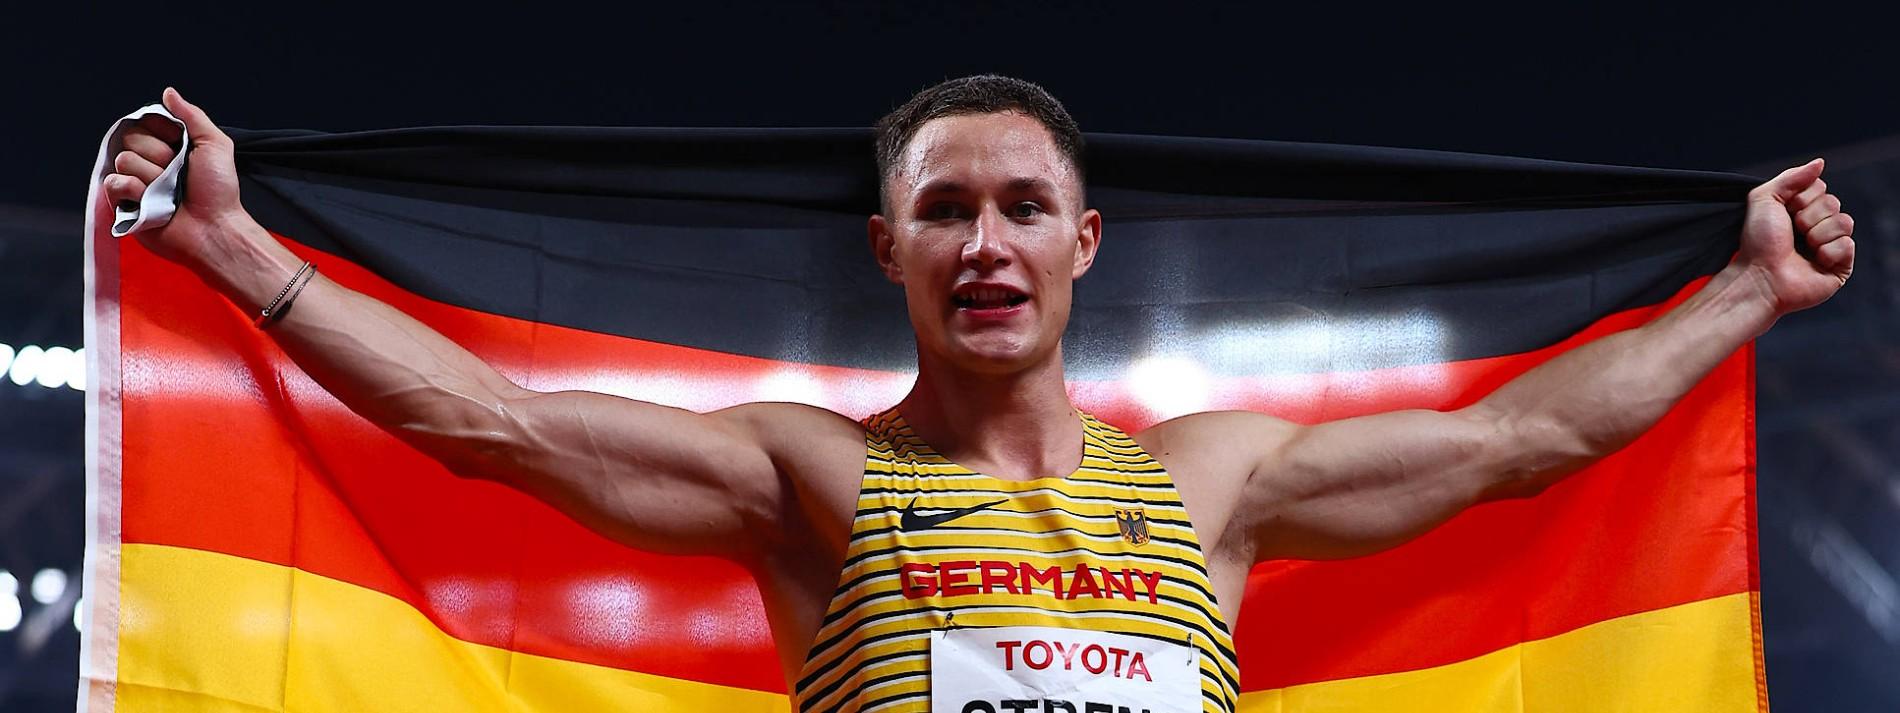 Streng sprintet zu Gold – dreimal Bronze